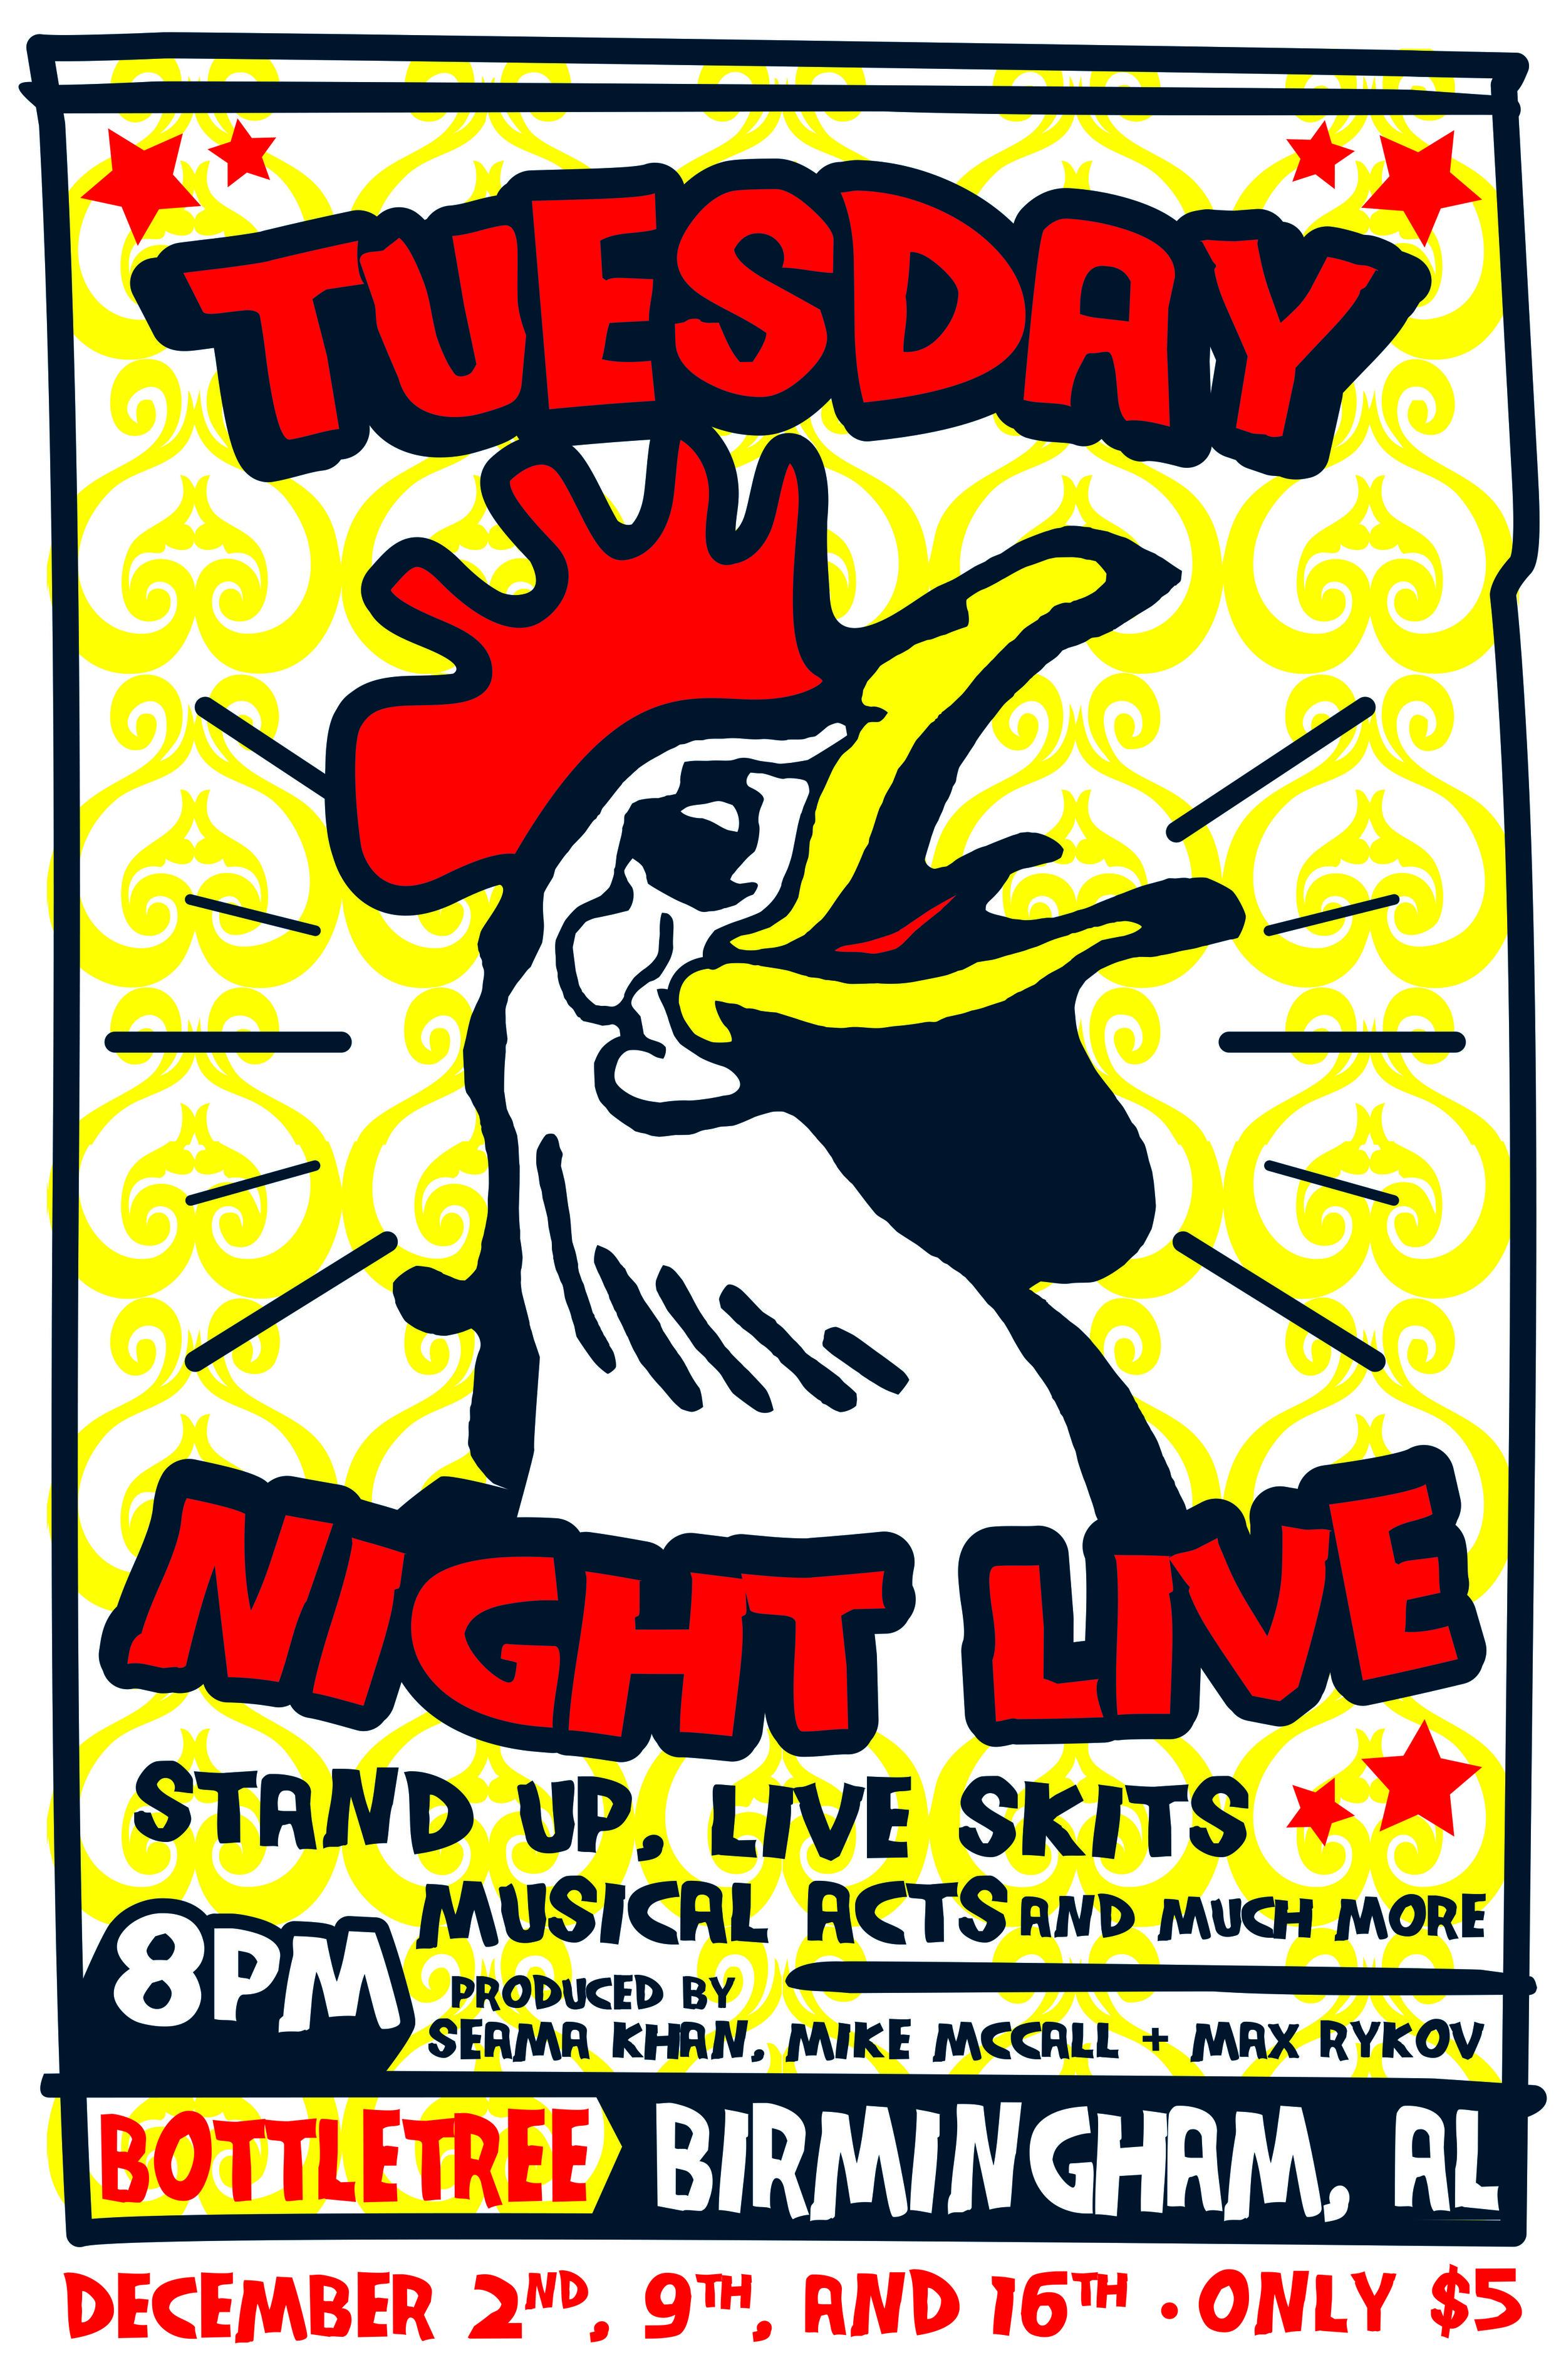 Tuesday Night Live.jpg